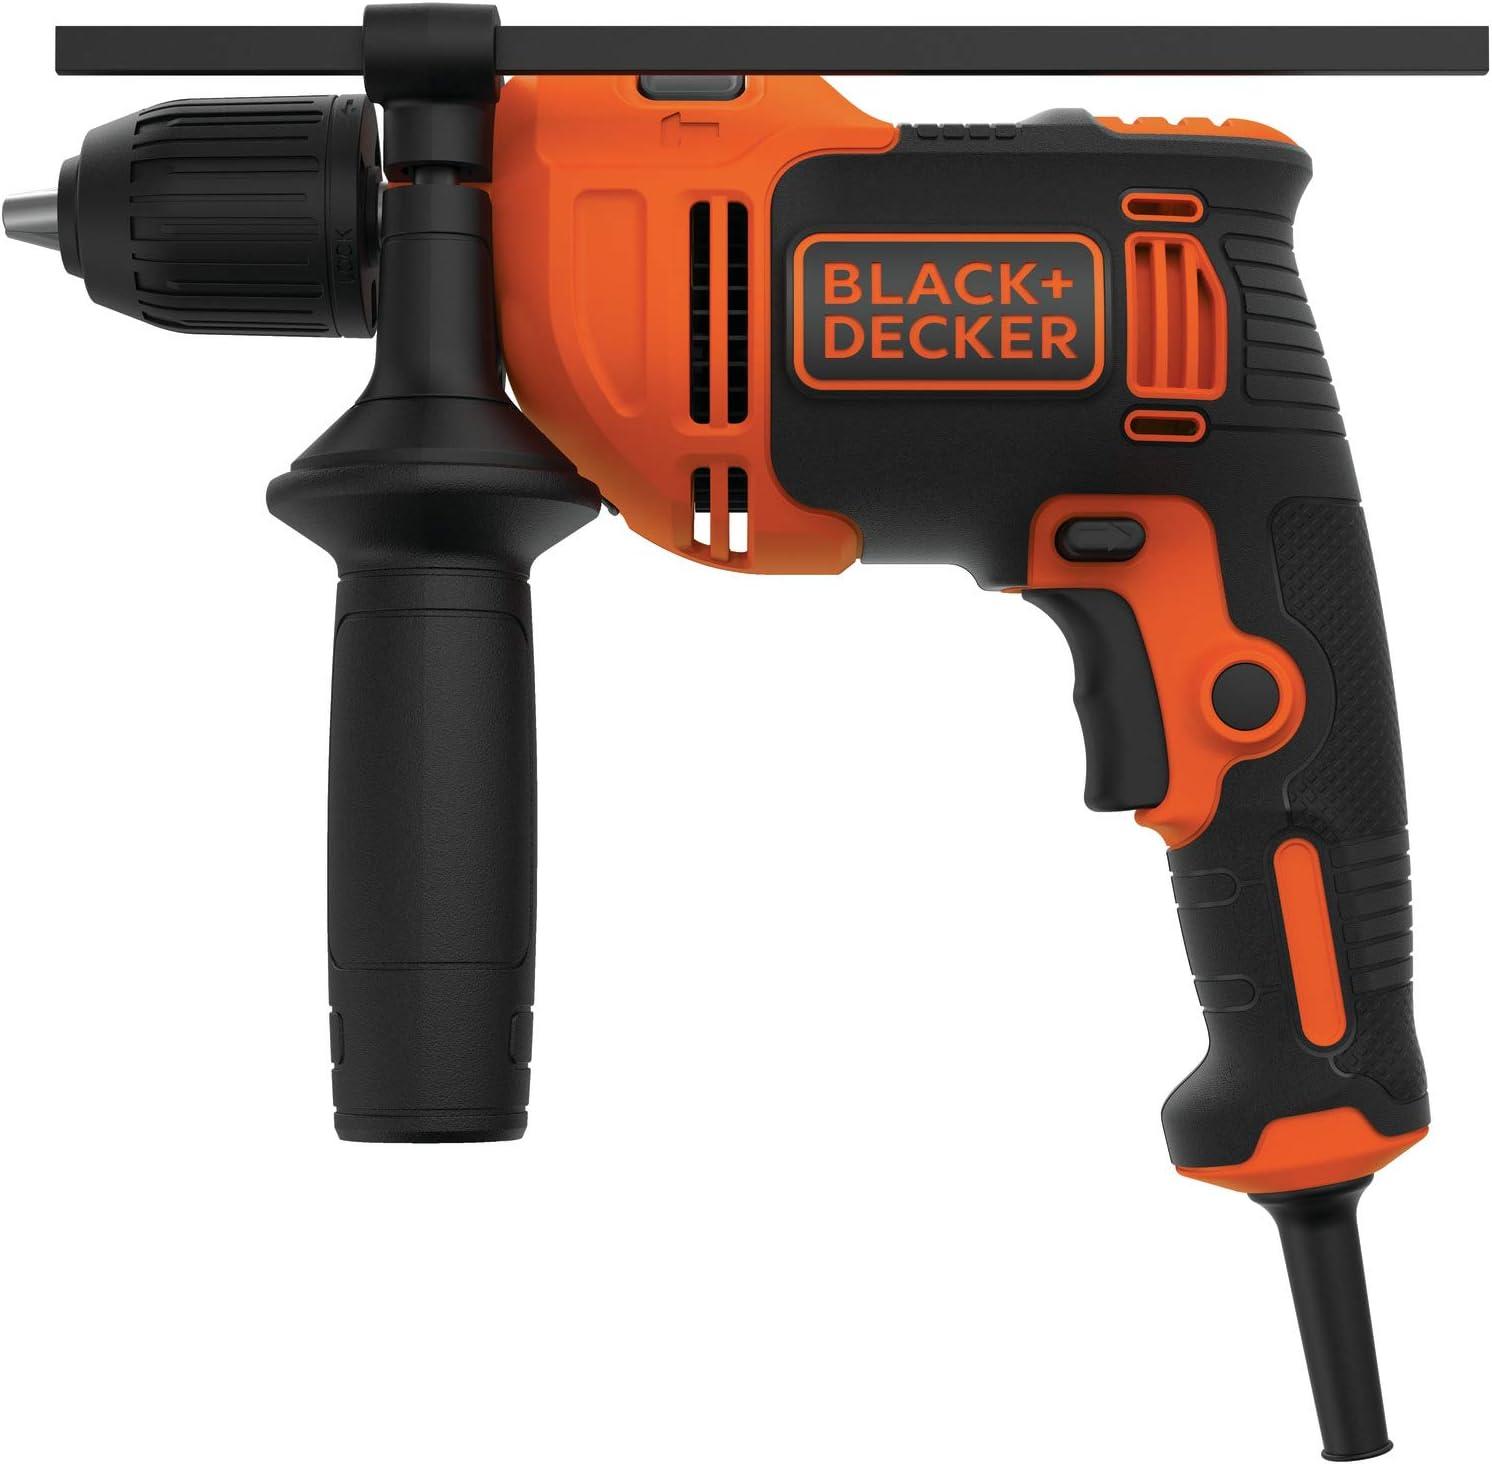 "Black+Decker BEHD201 1/2"" Hammer Drill"